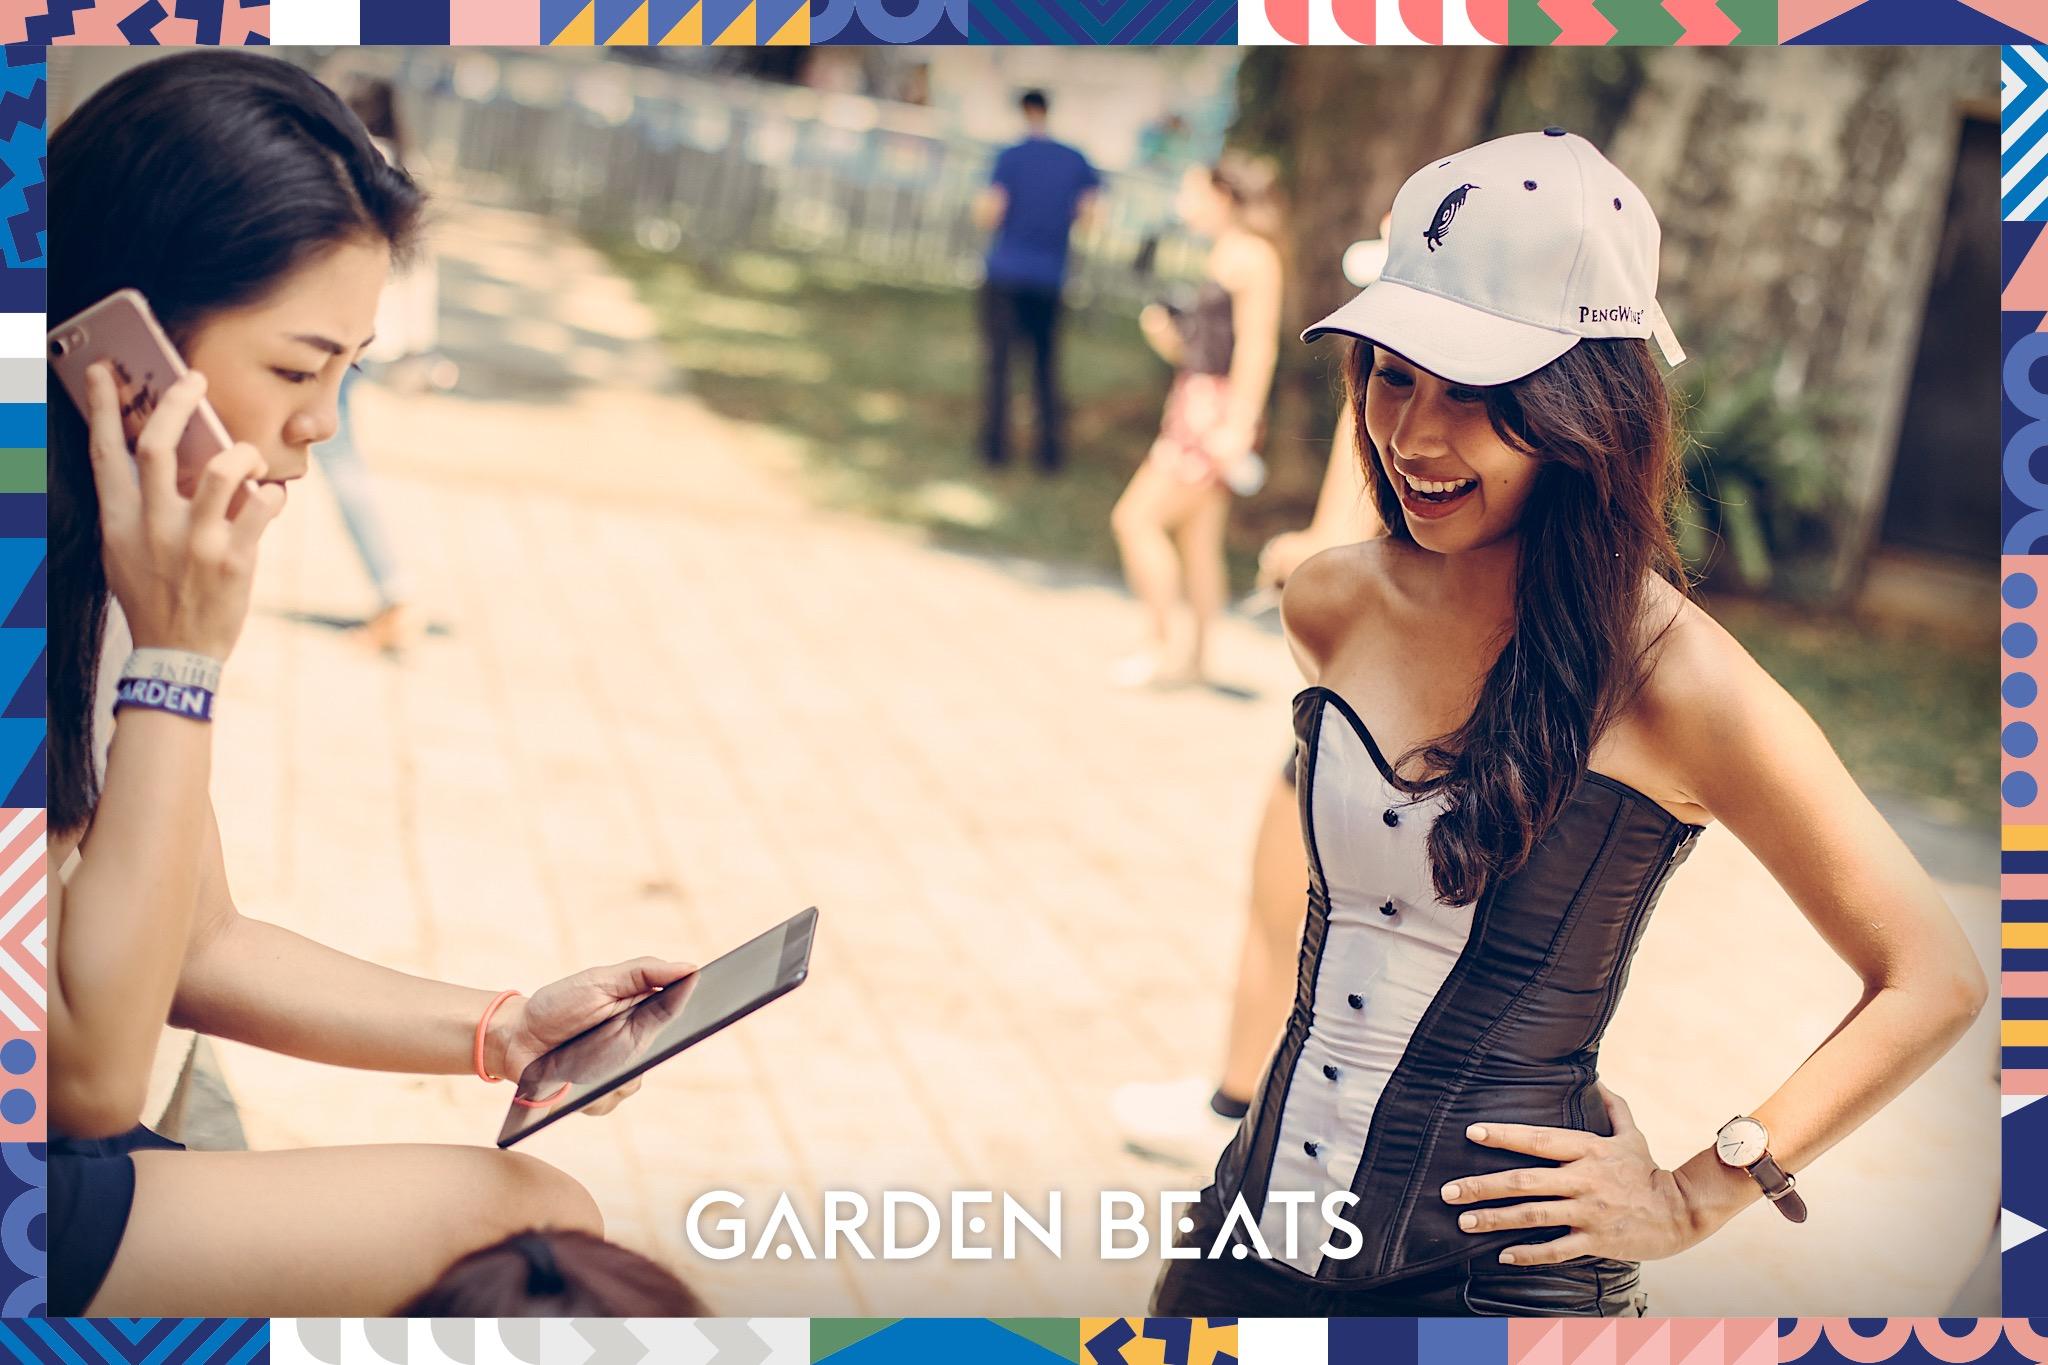 03032018_GardenBeats_Colossal160_Watermarked.jpg